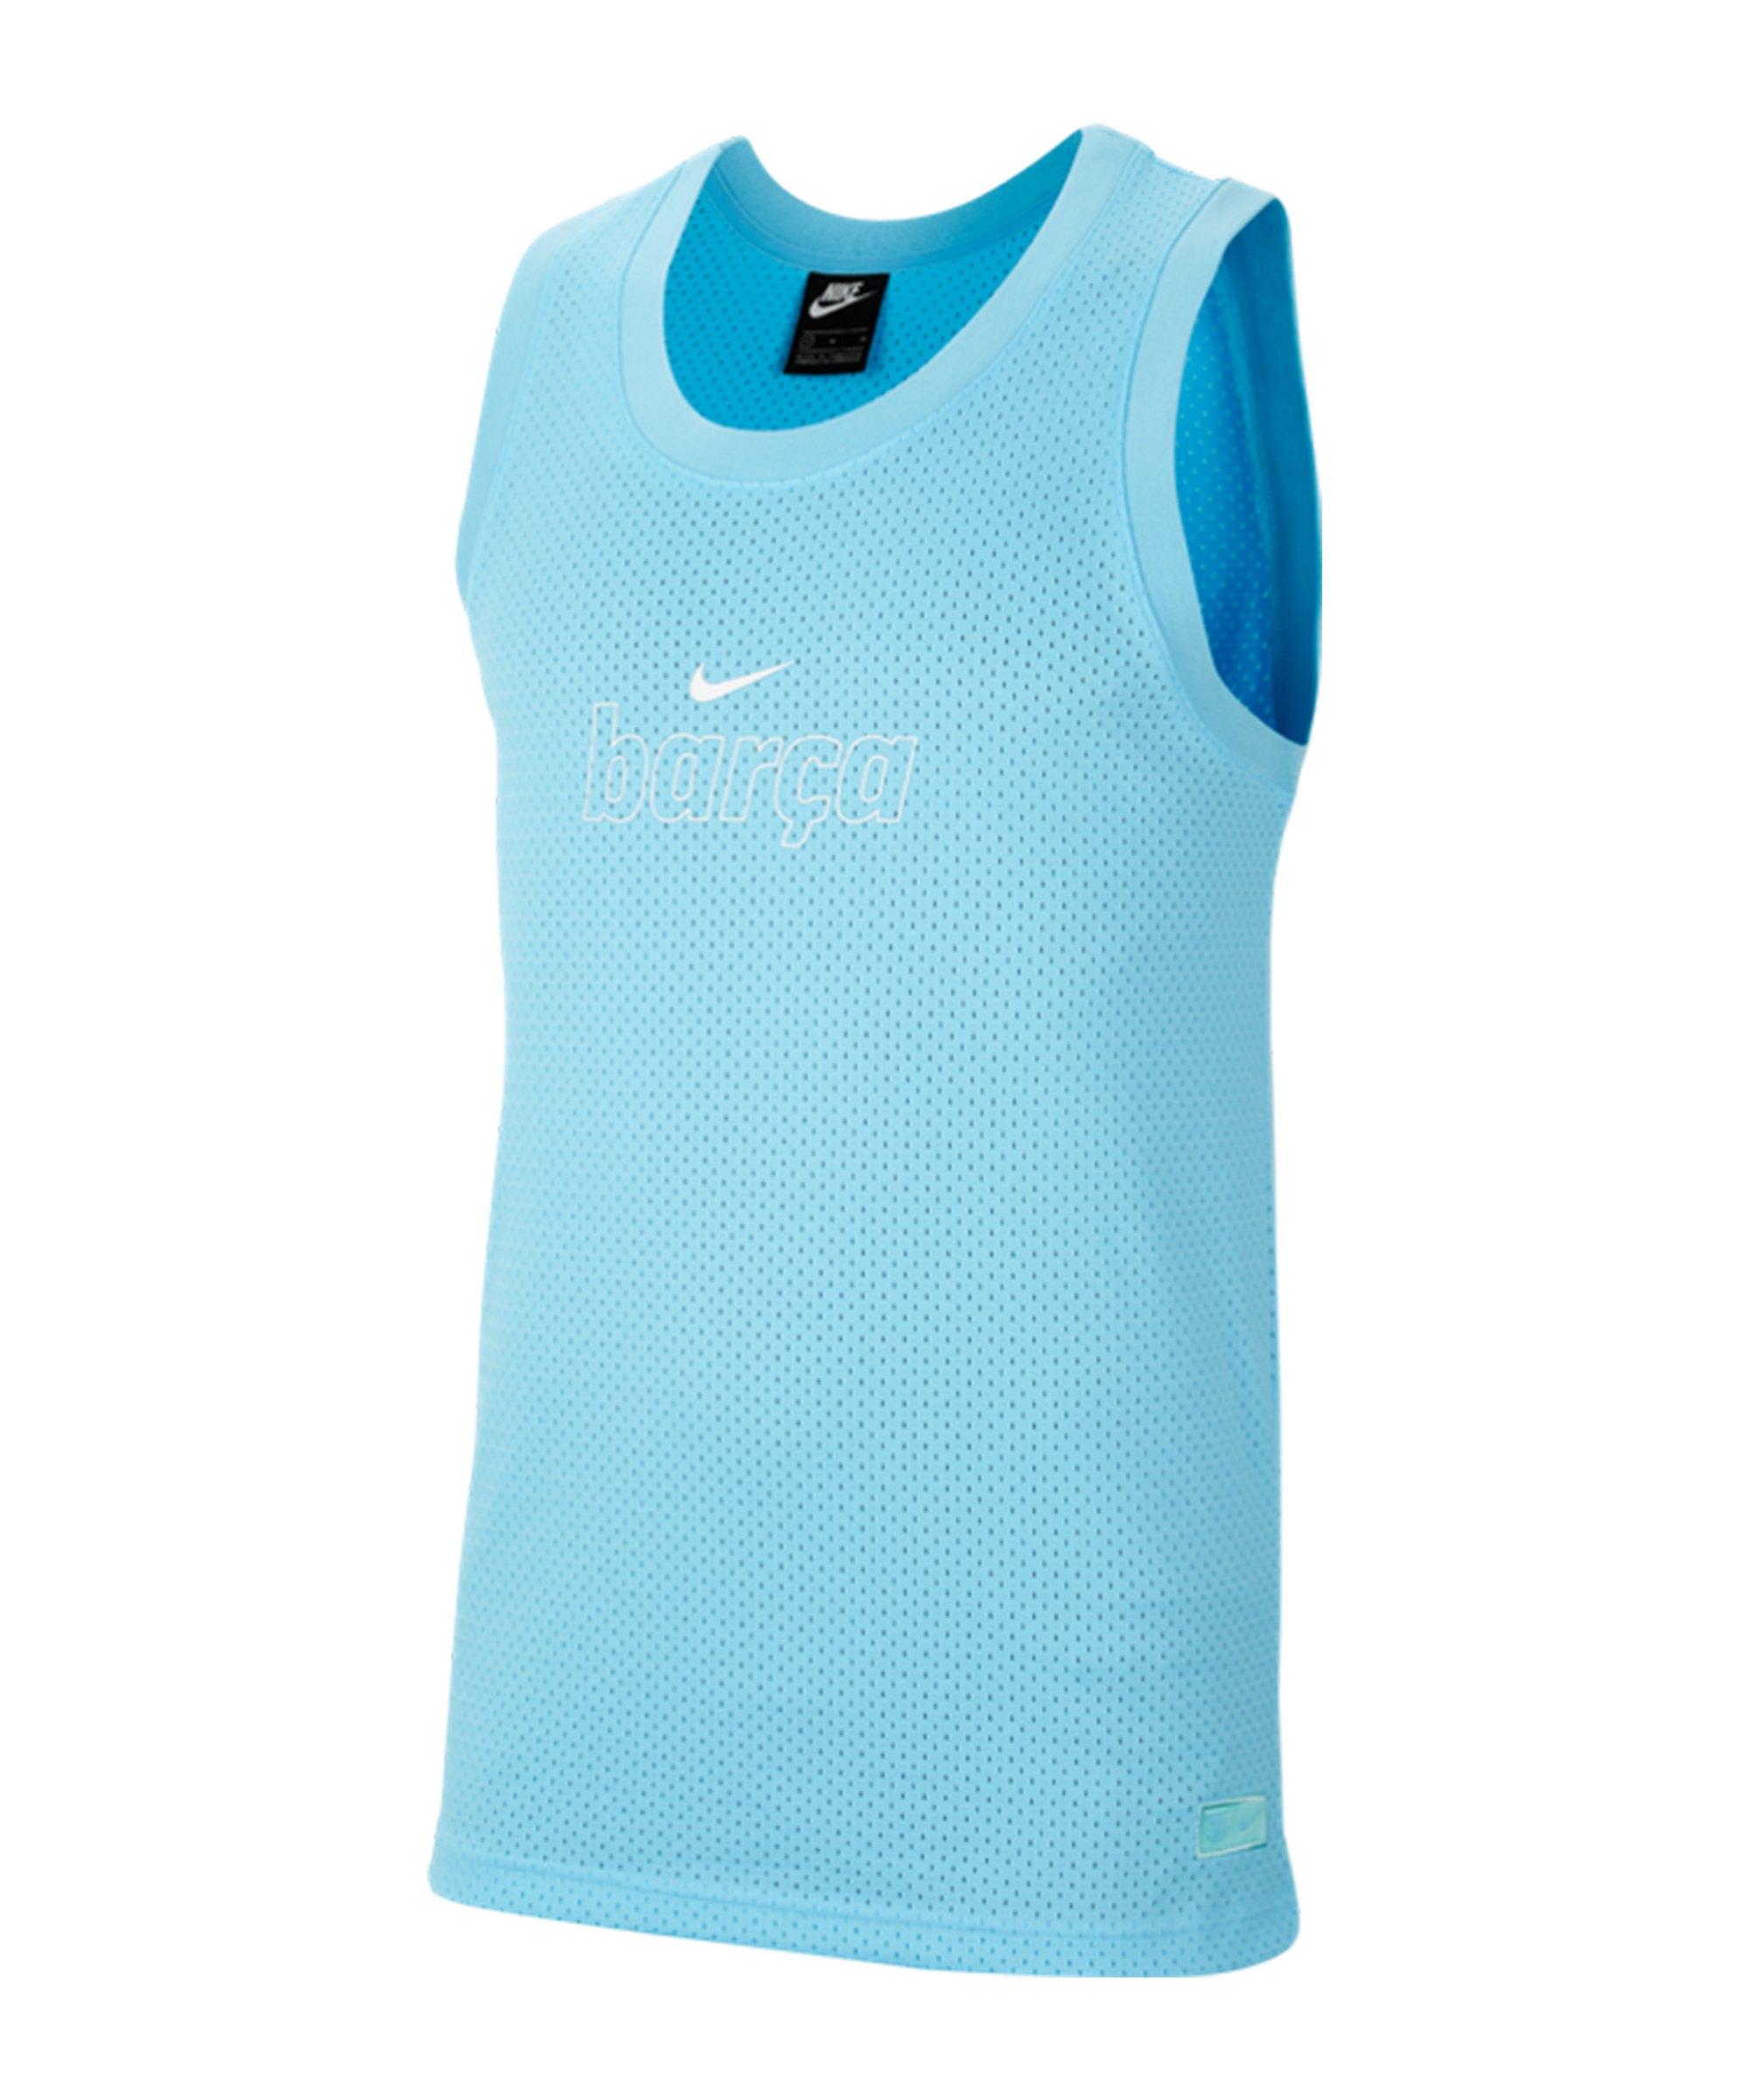 Nike FC Barcelona Tanktop Blau F425 - blau